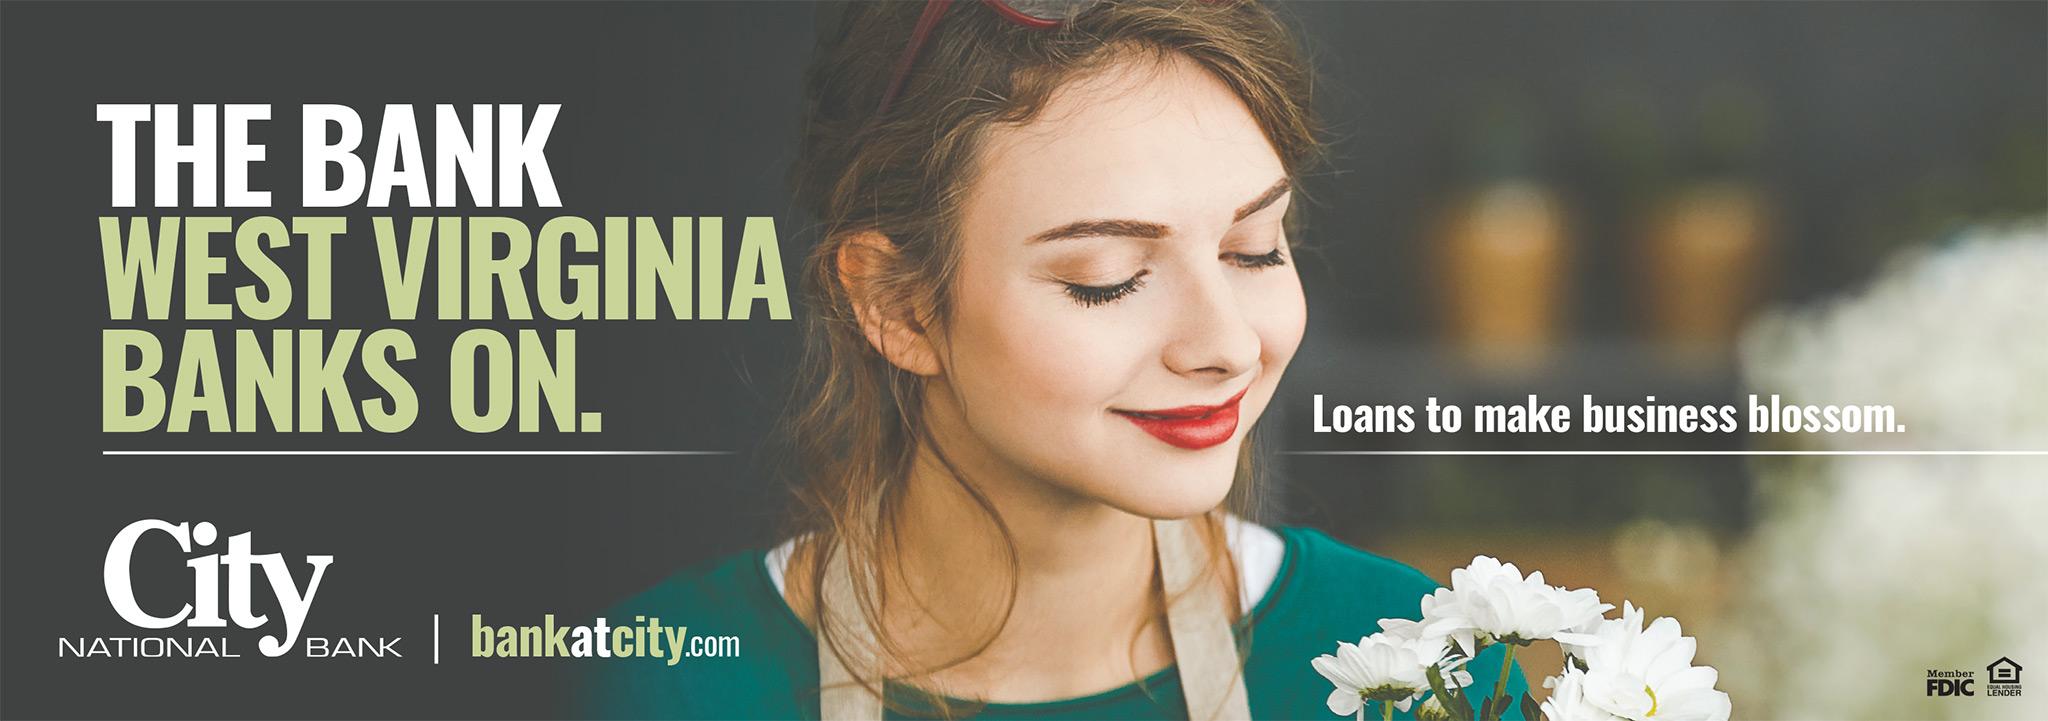 City National Bank, Make Business Blossom Print Ad